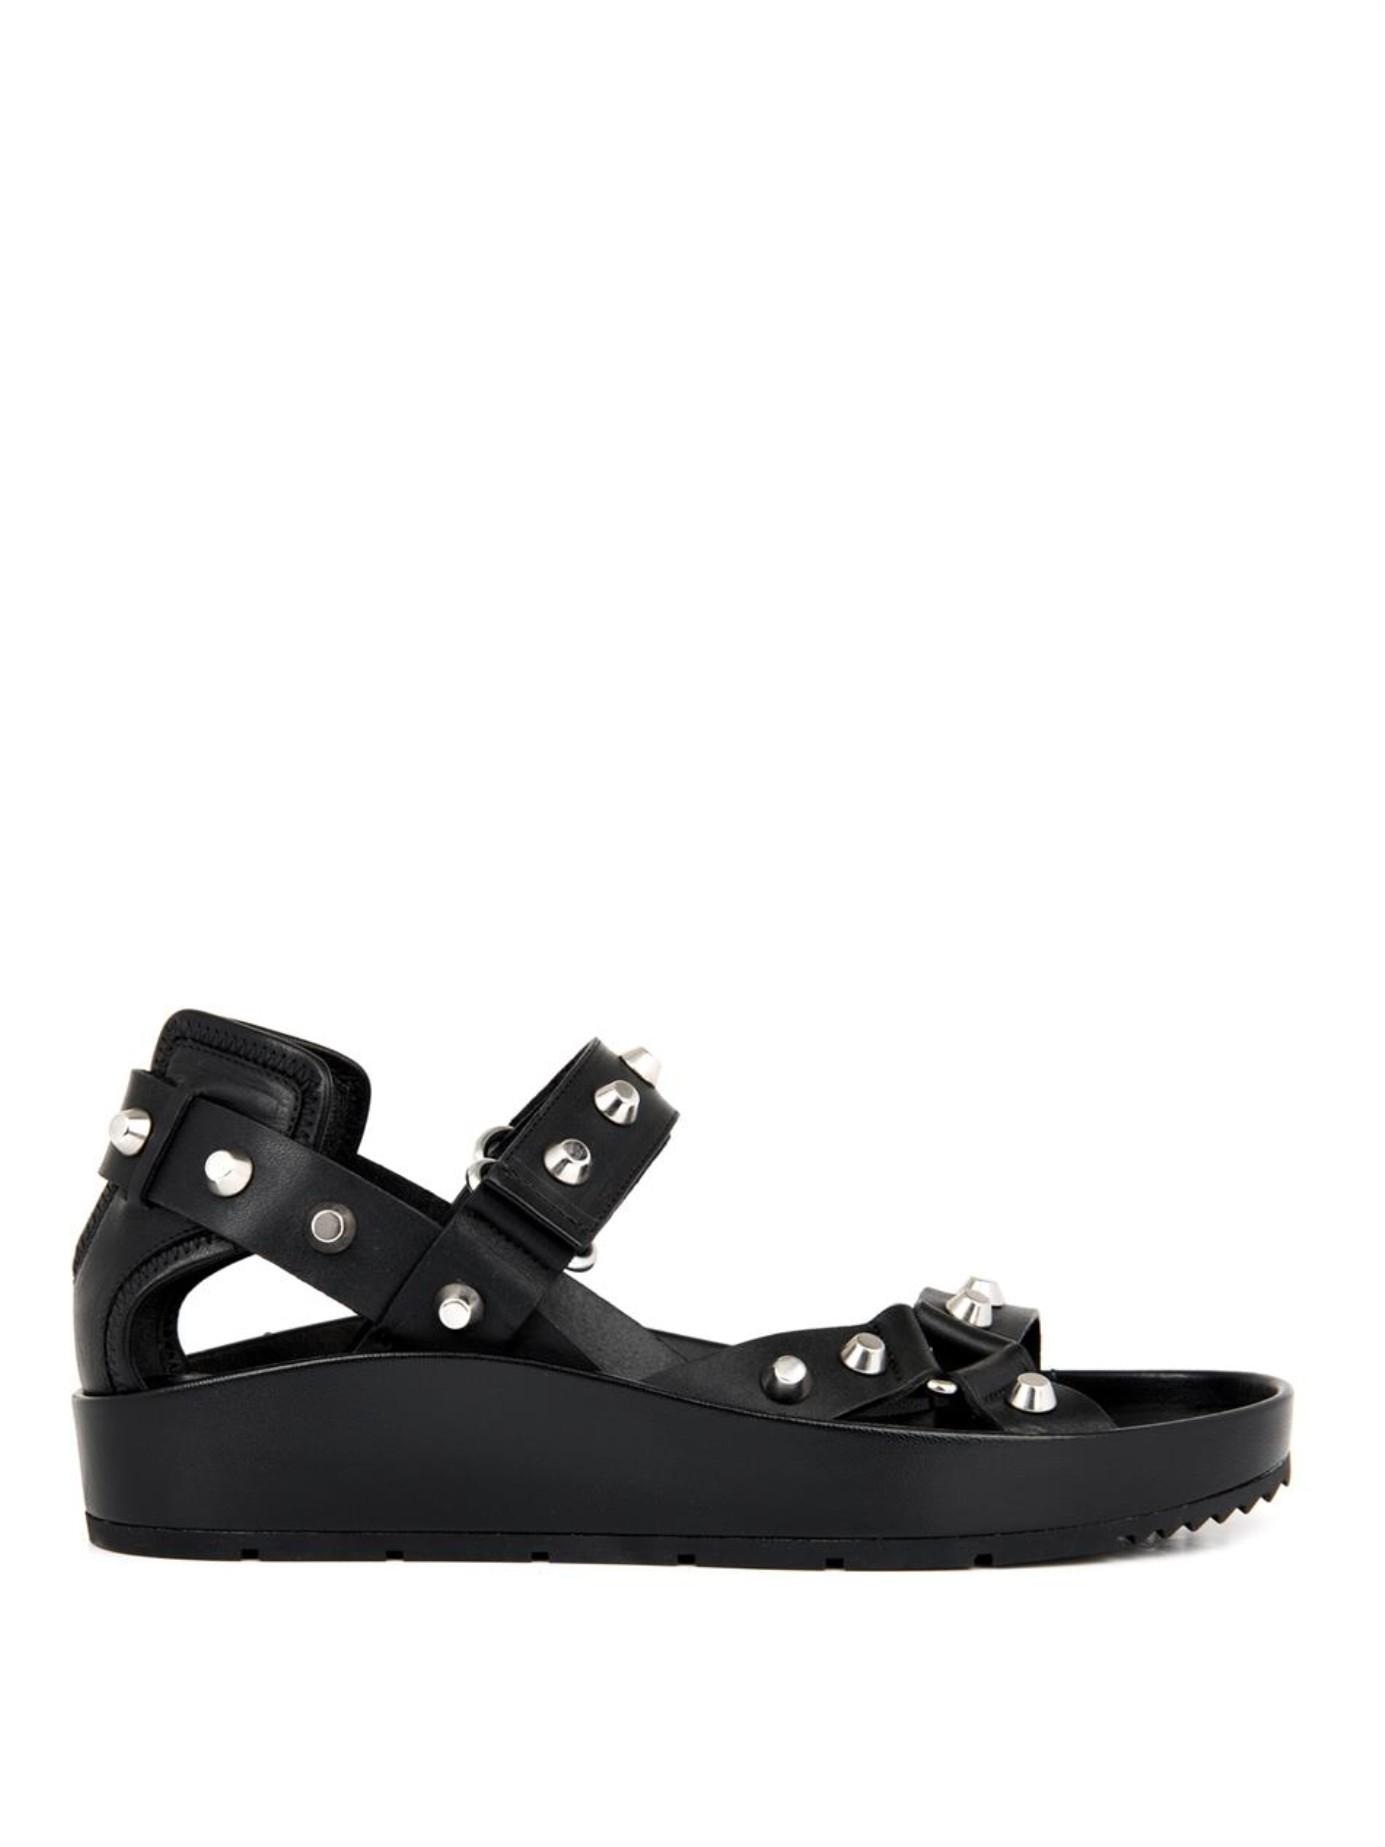 959b780a847a Balenciaga Arena Stud Leather Platform Sandals in Black - Lyst